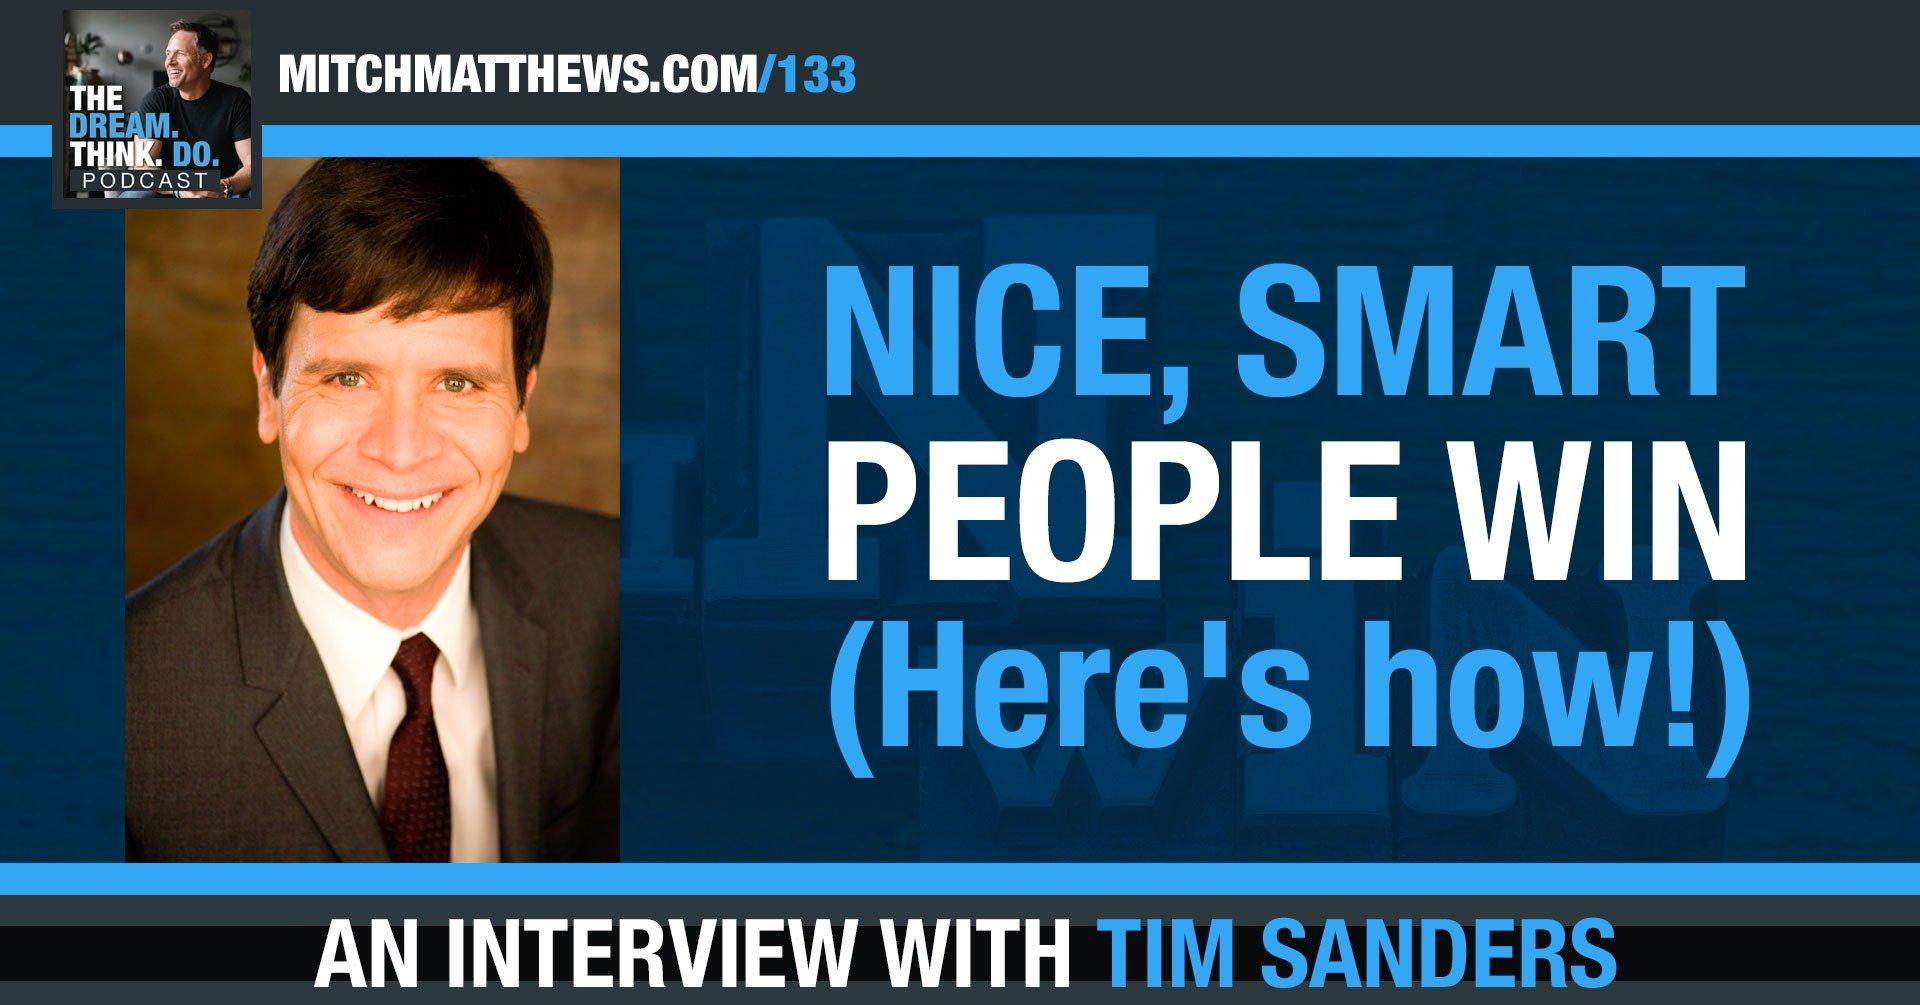 Tim Sanders - Nice Smart People Win - (Here's how!)